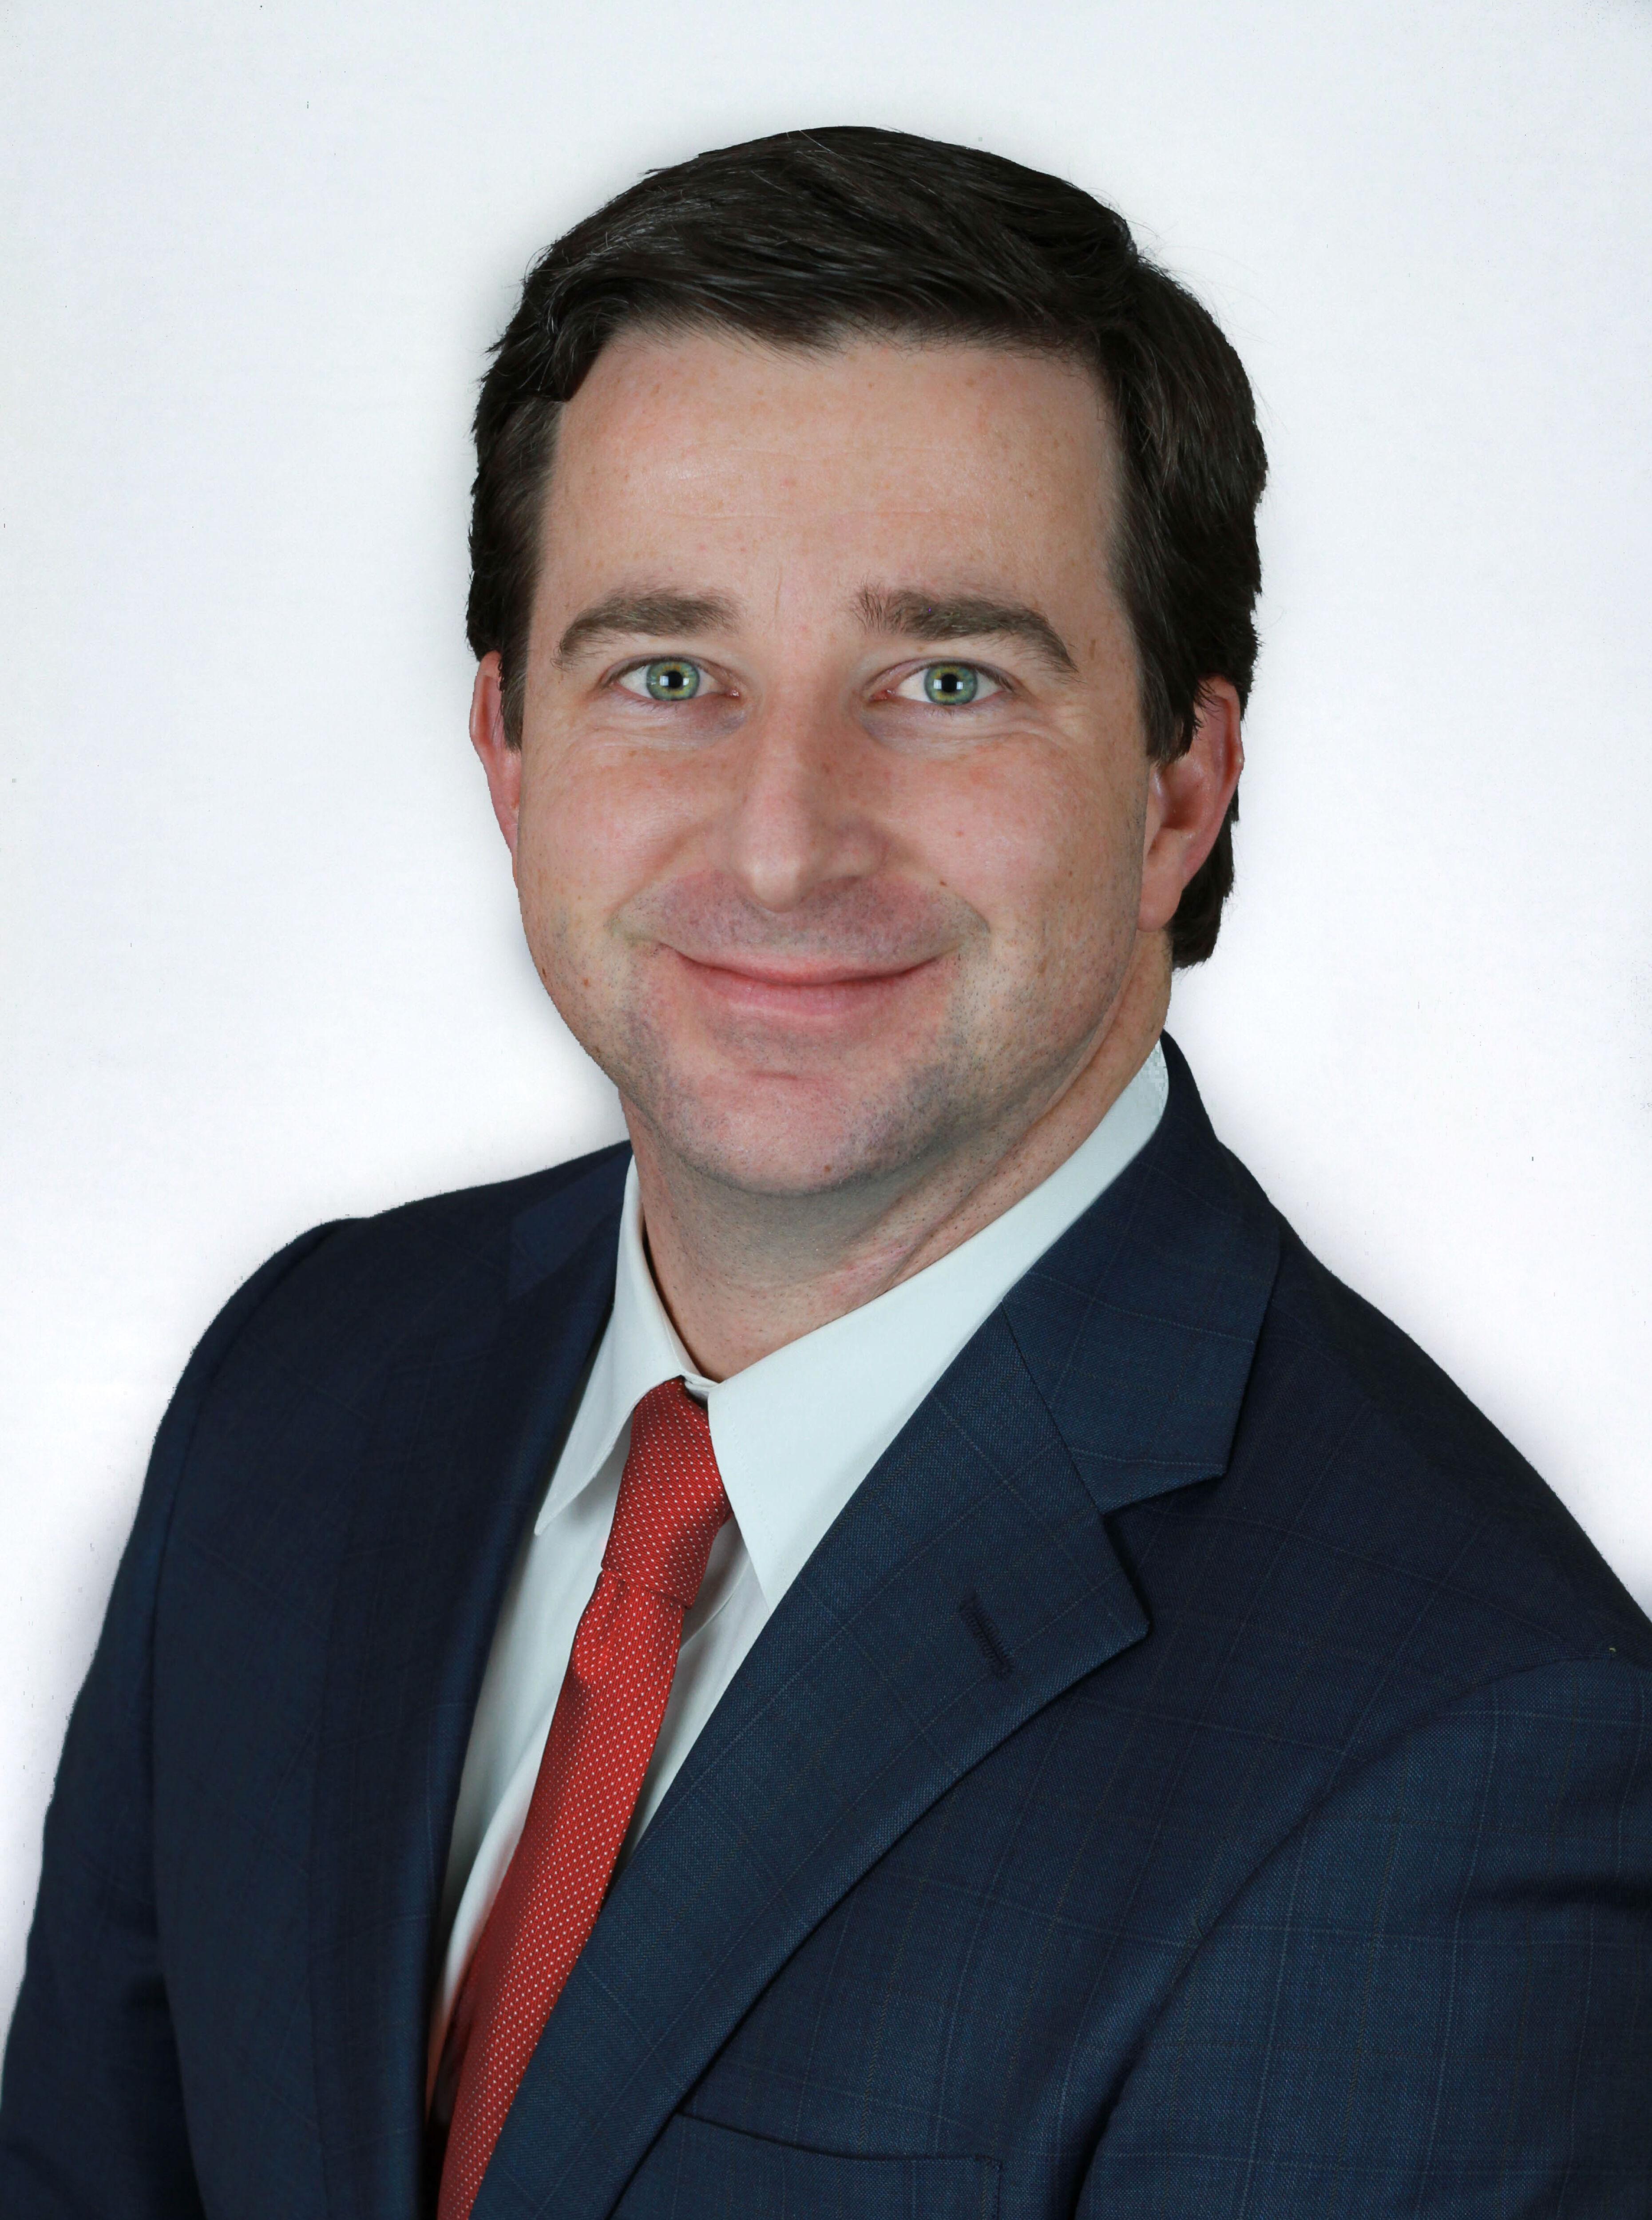 Chris Semple